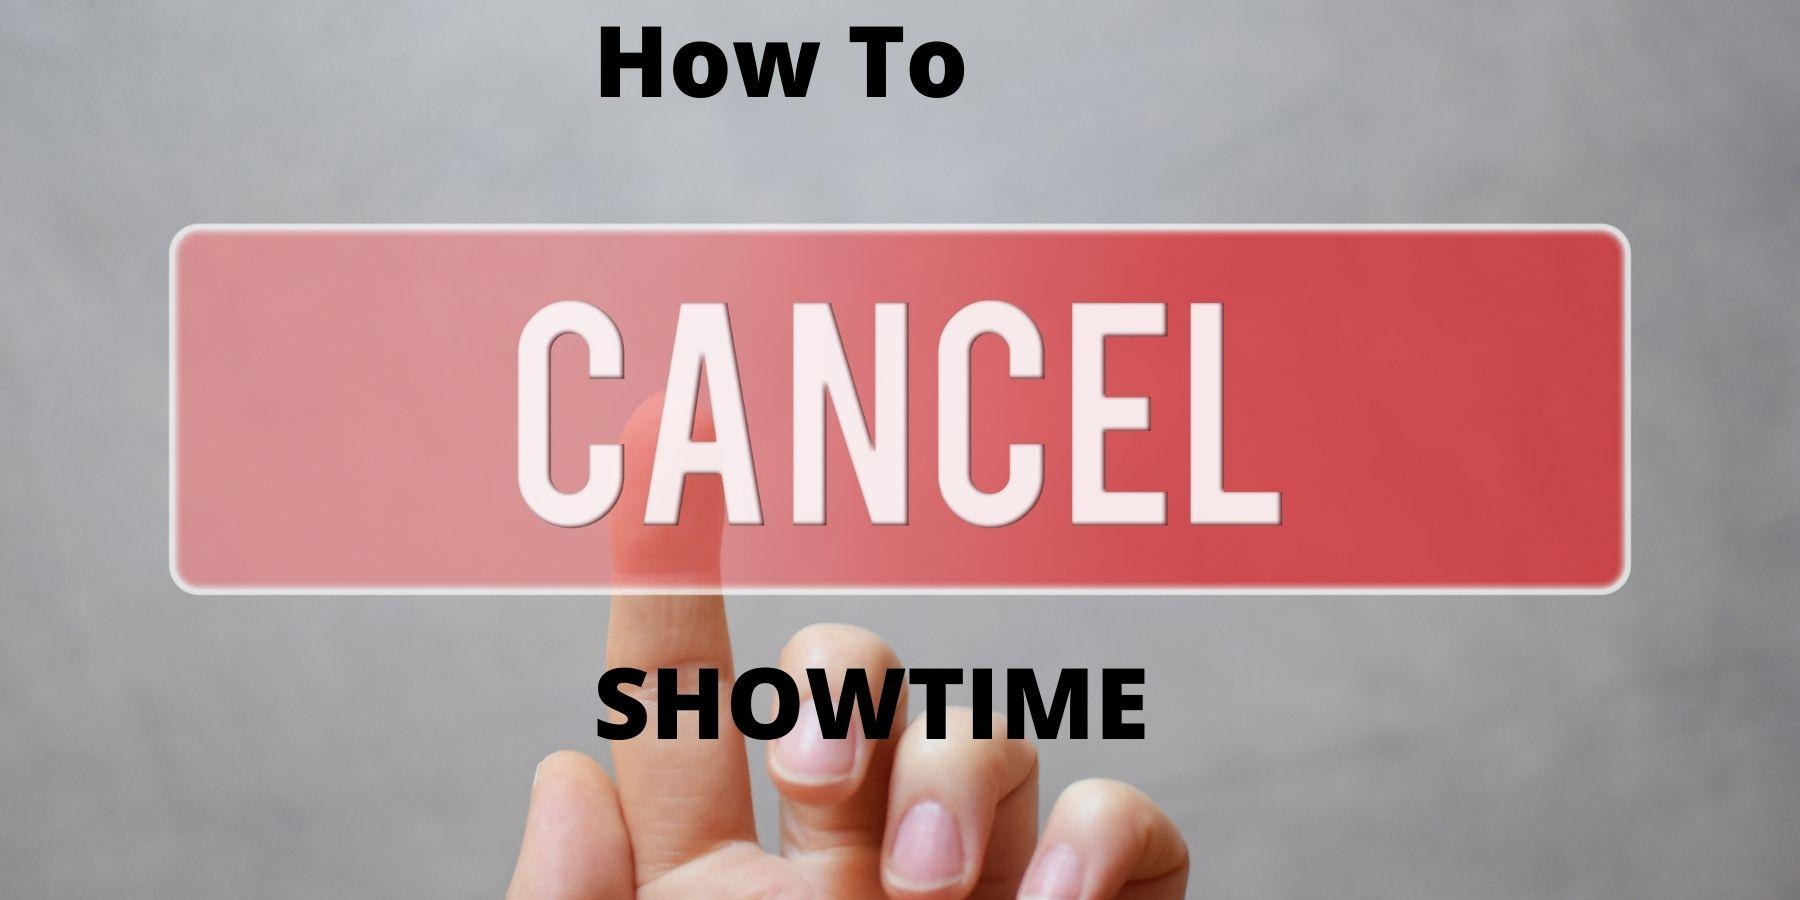 cancel showtime